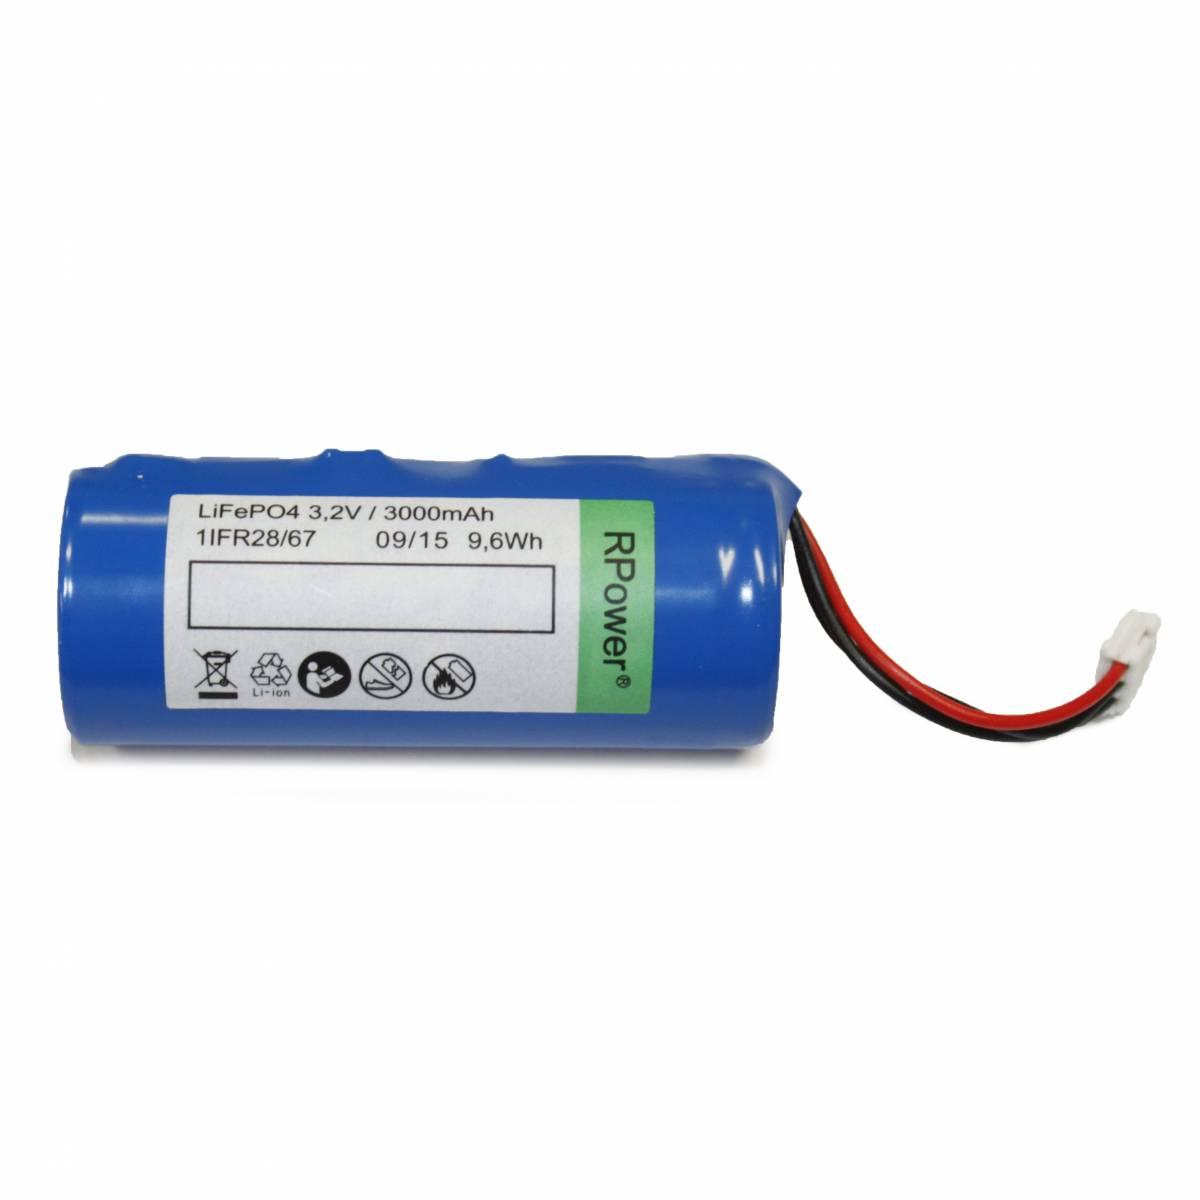 Accu 3,2V 3,0Ah LiFePO4 for LED luminaire KM,KSC,KMB,ASM,ZAW